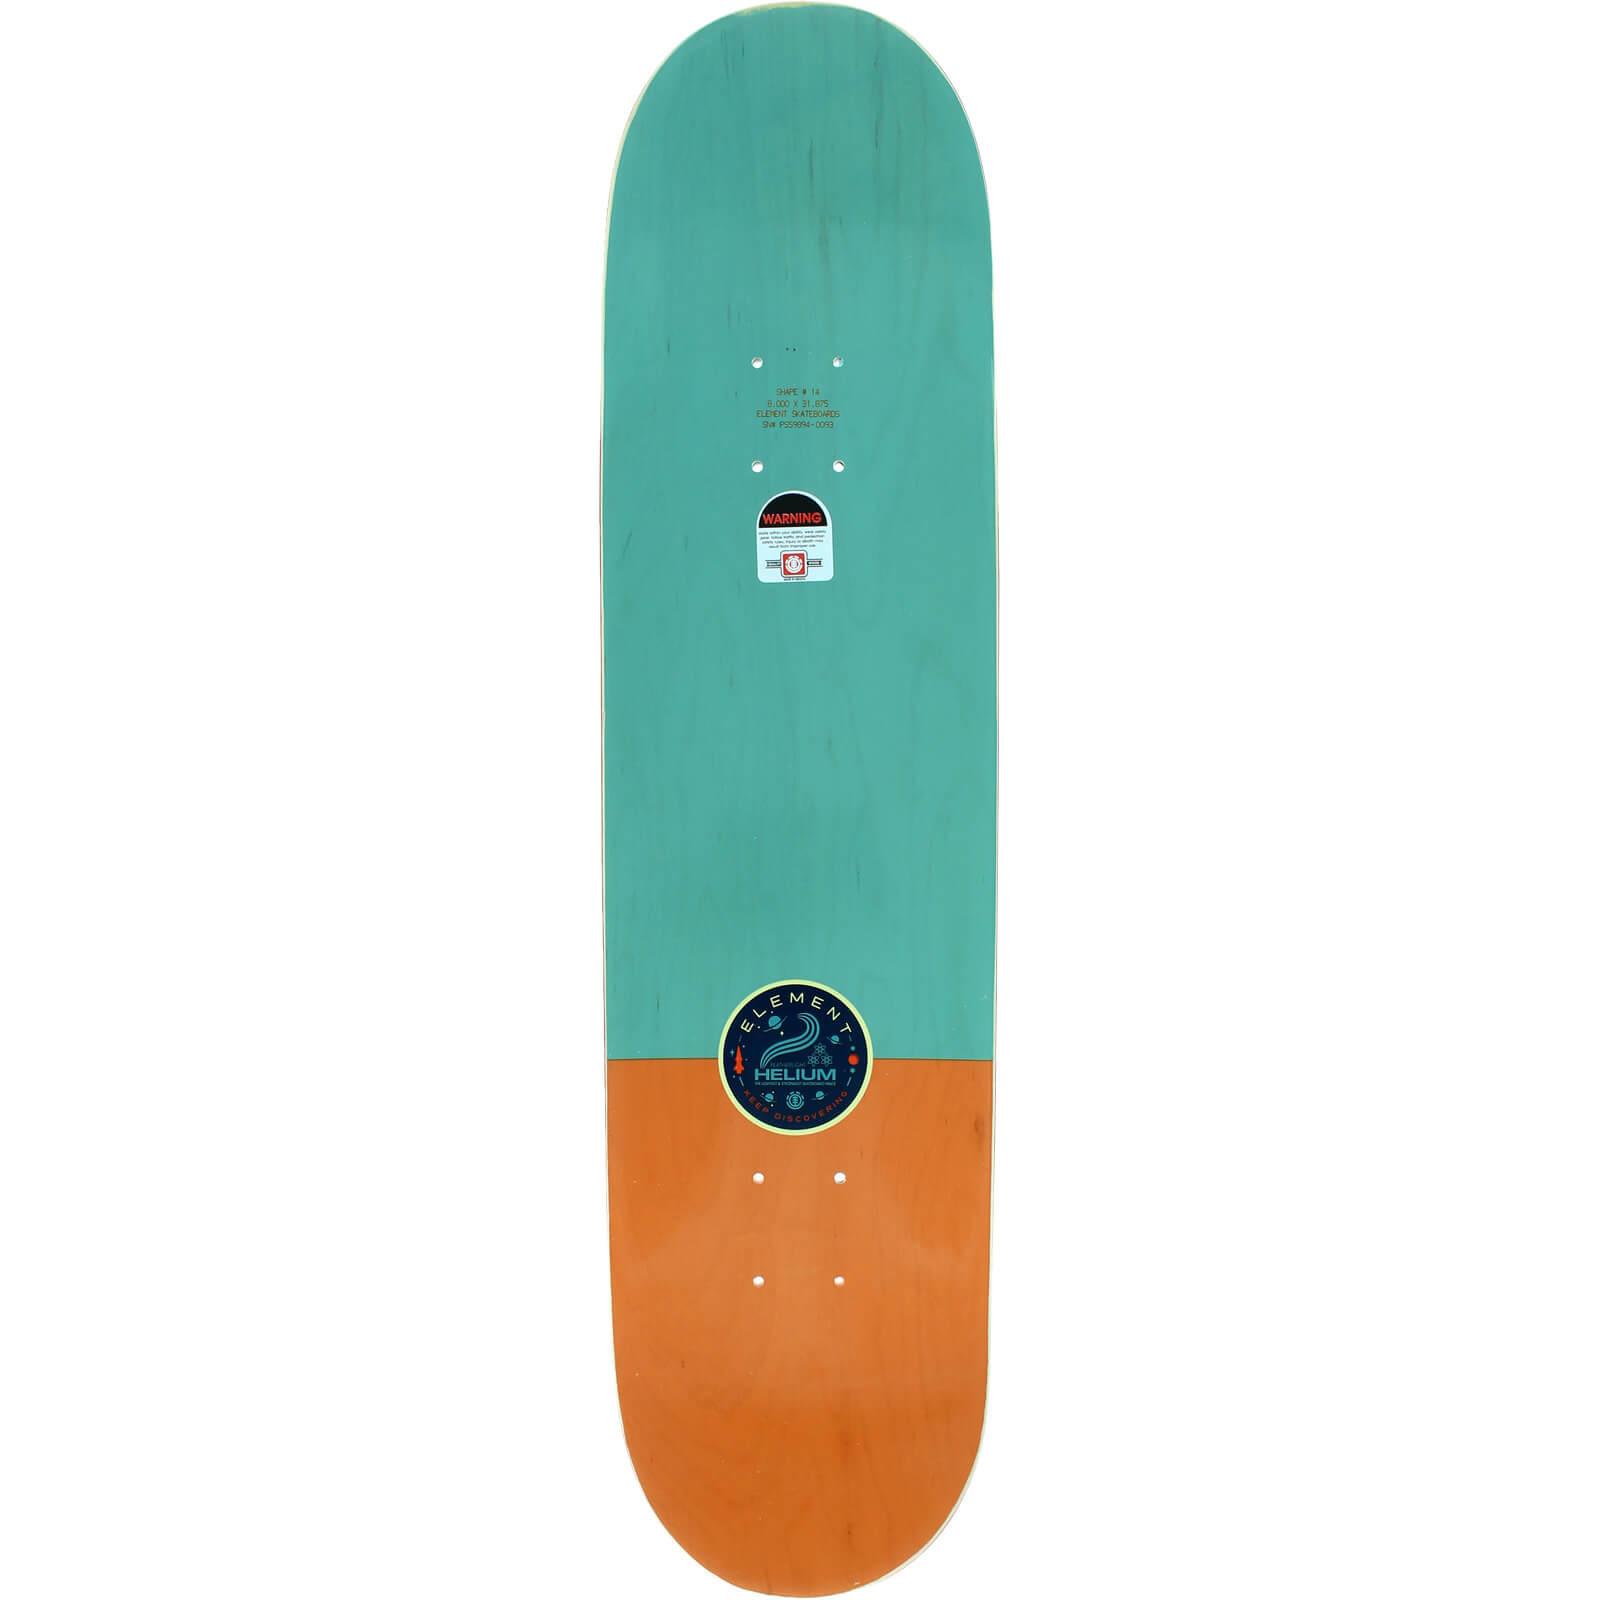 Element Skateboards Nyjah Huston Helium Cosmonaut ...